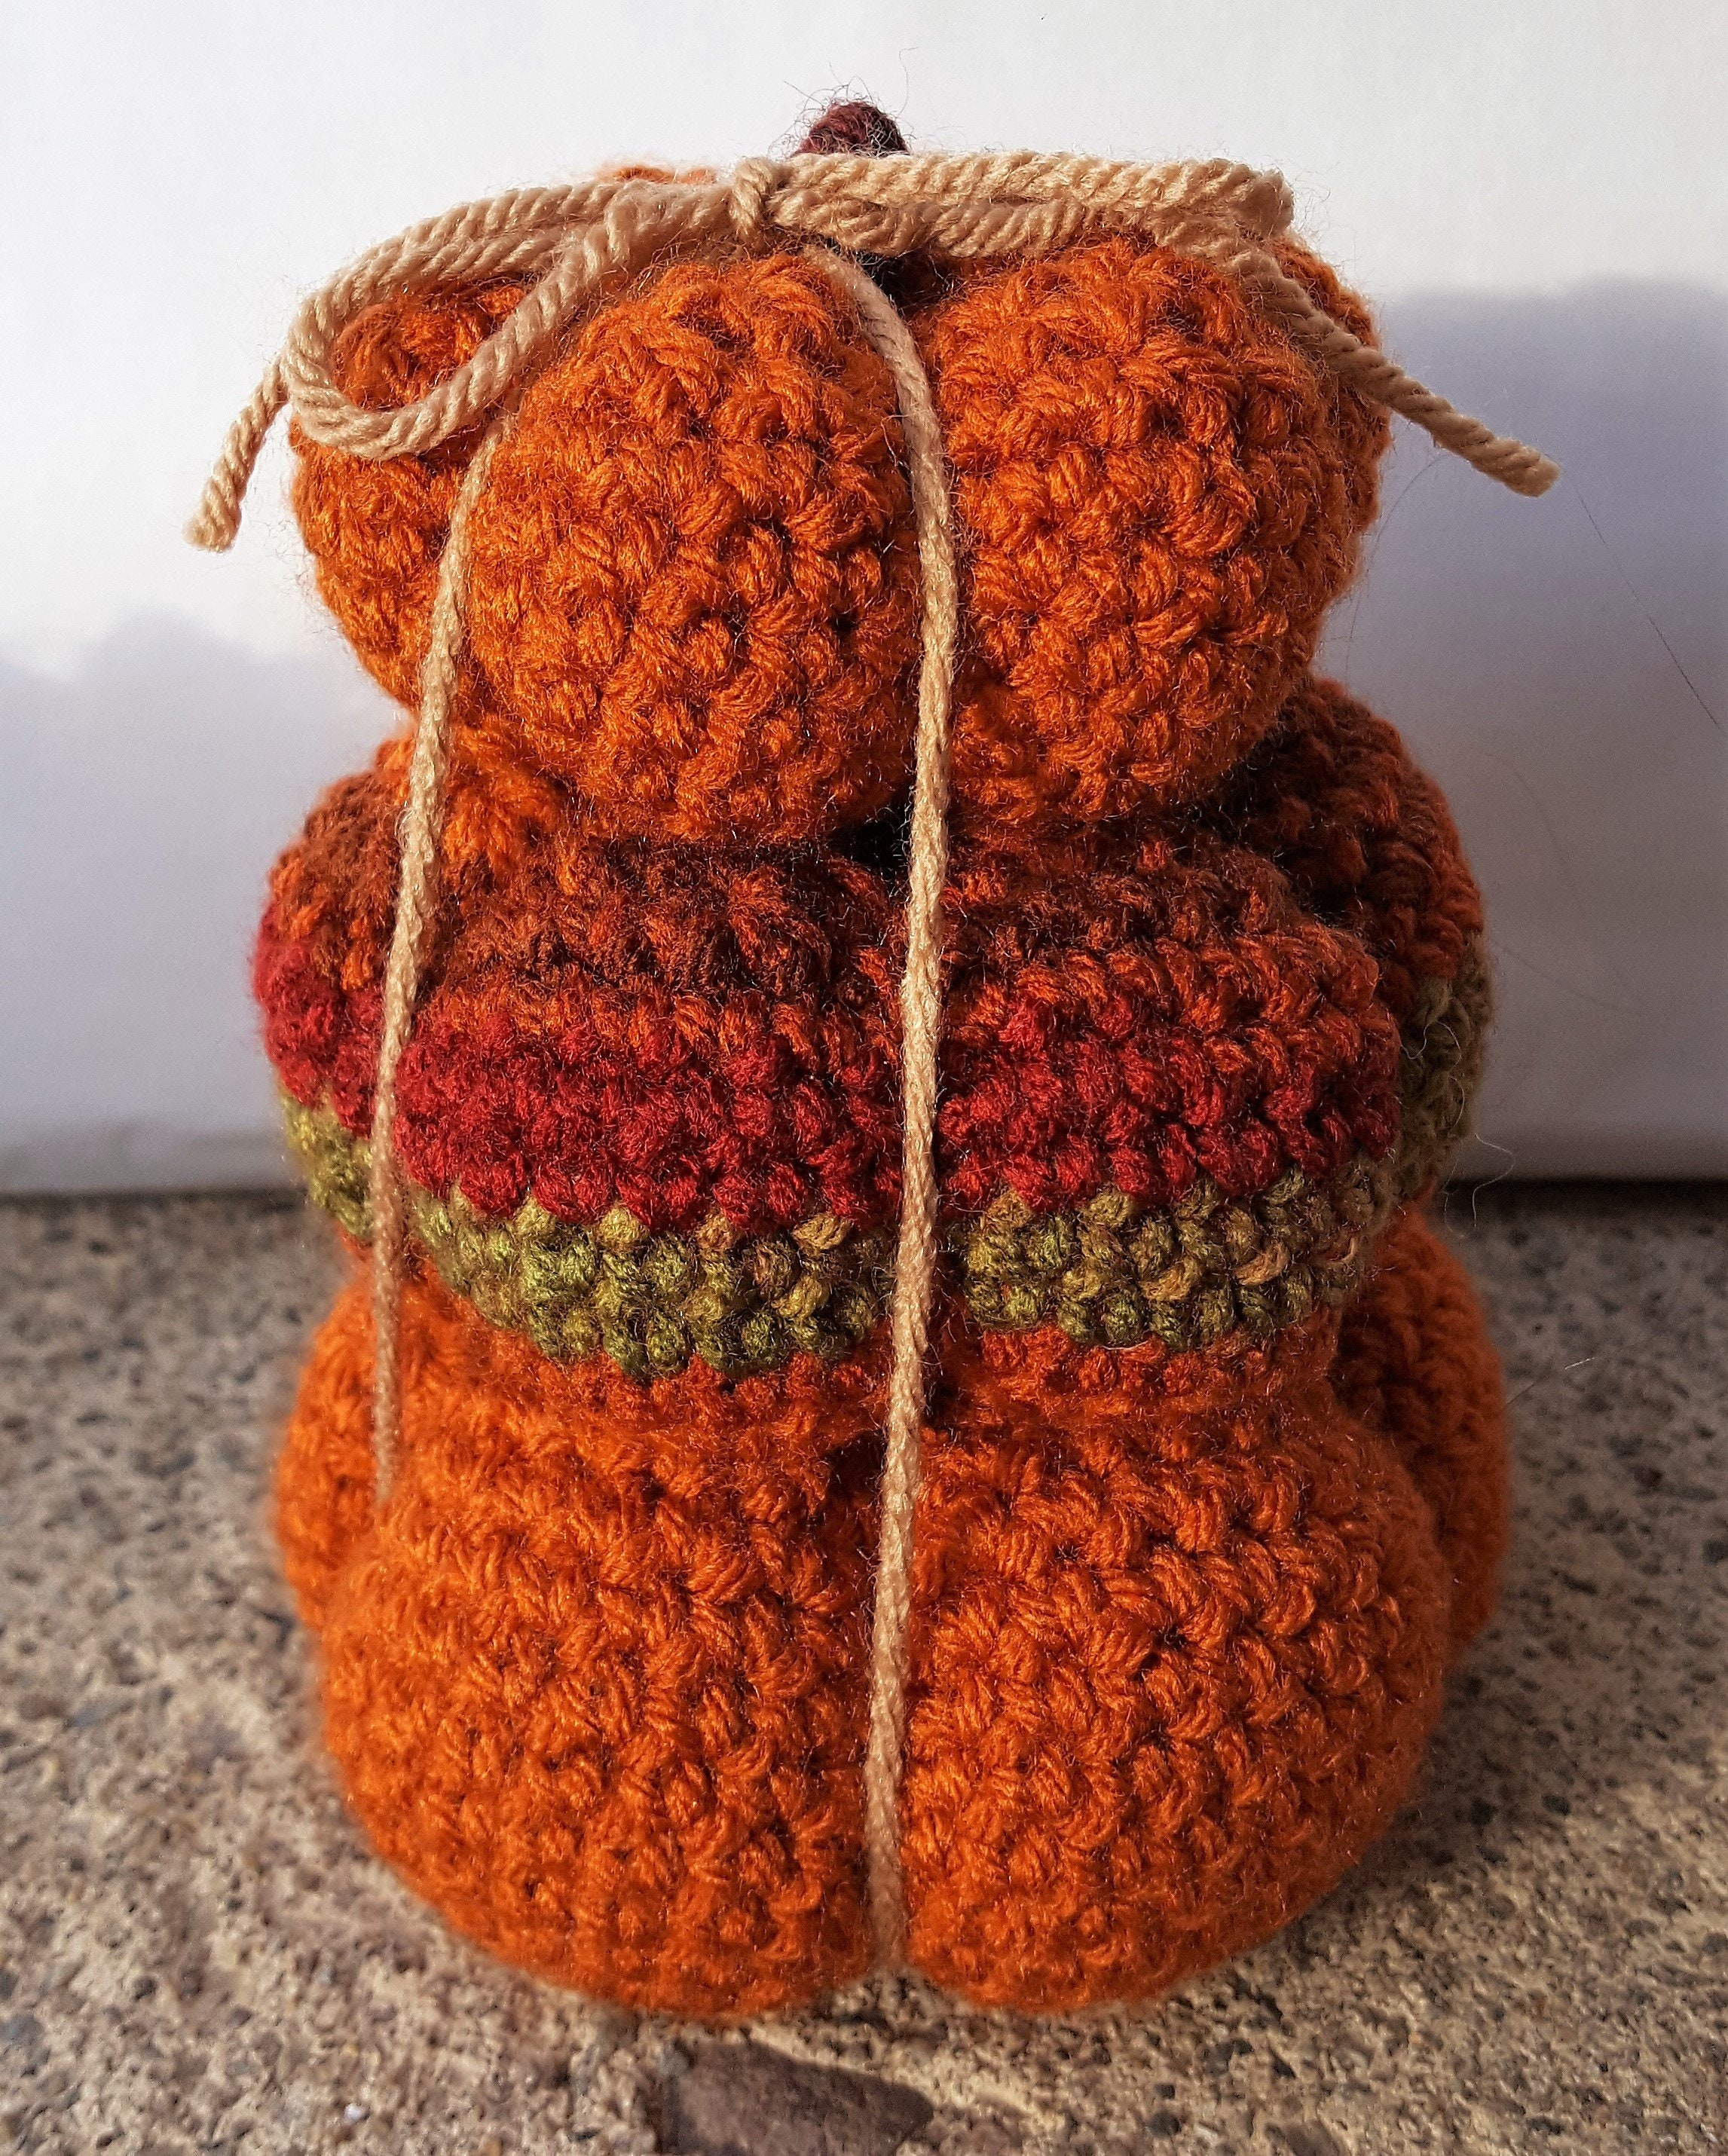 Crochet Pumpkins Stuffed Set Of 3 Pumpkins 3 Sizes Small Etsy